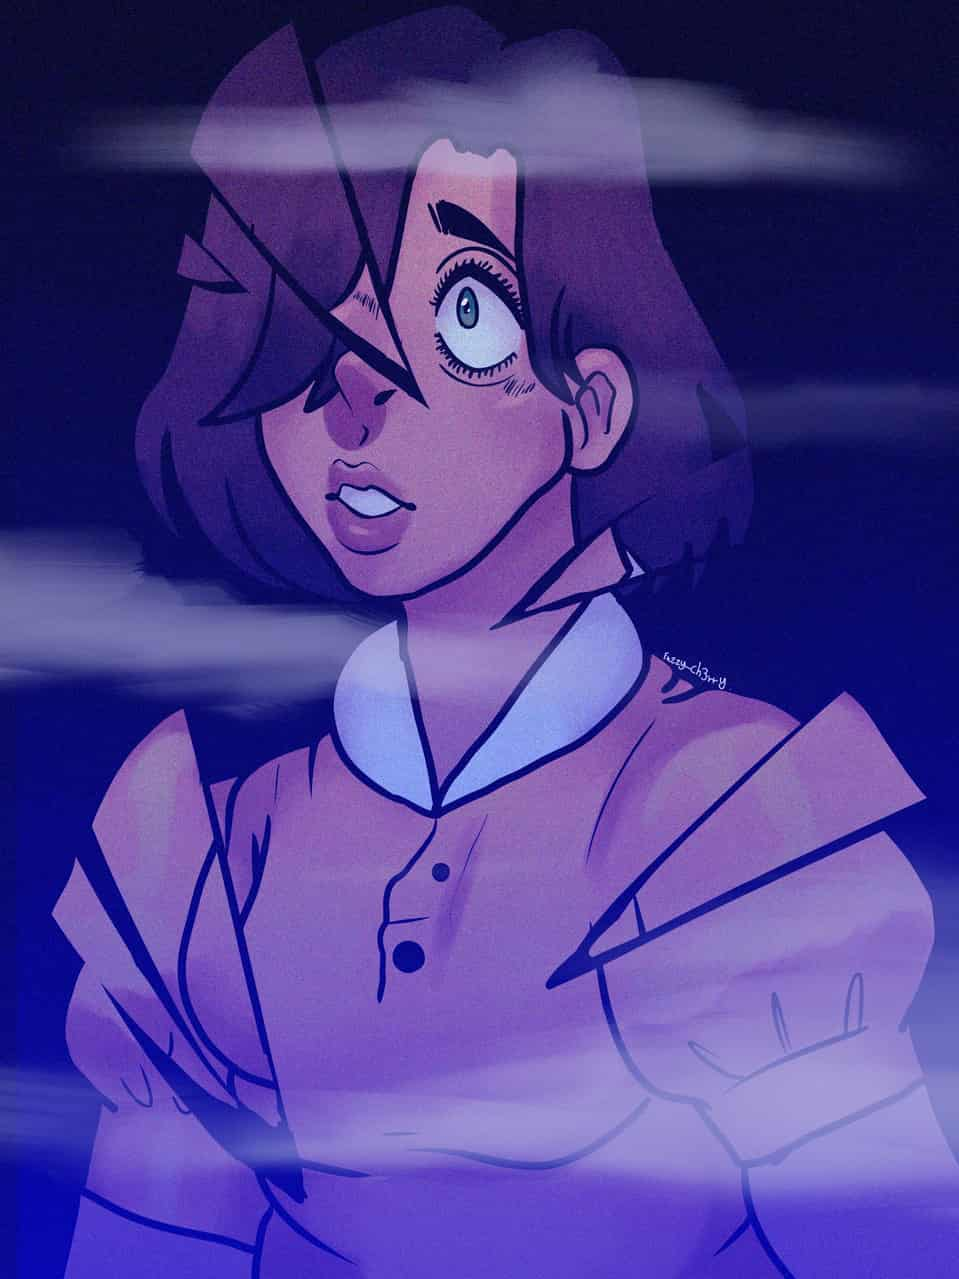 Goretober day 19: broken glass (repost)  Illust of ♣︎Ch3rry_Pi3♣︎|Edd dark Fuzzy_ch3rry girl Mist eyes medibangpaint blue Goretober creepy gore